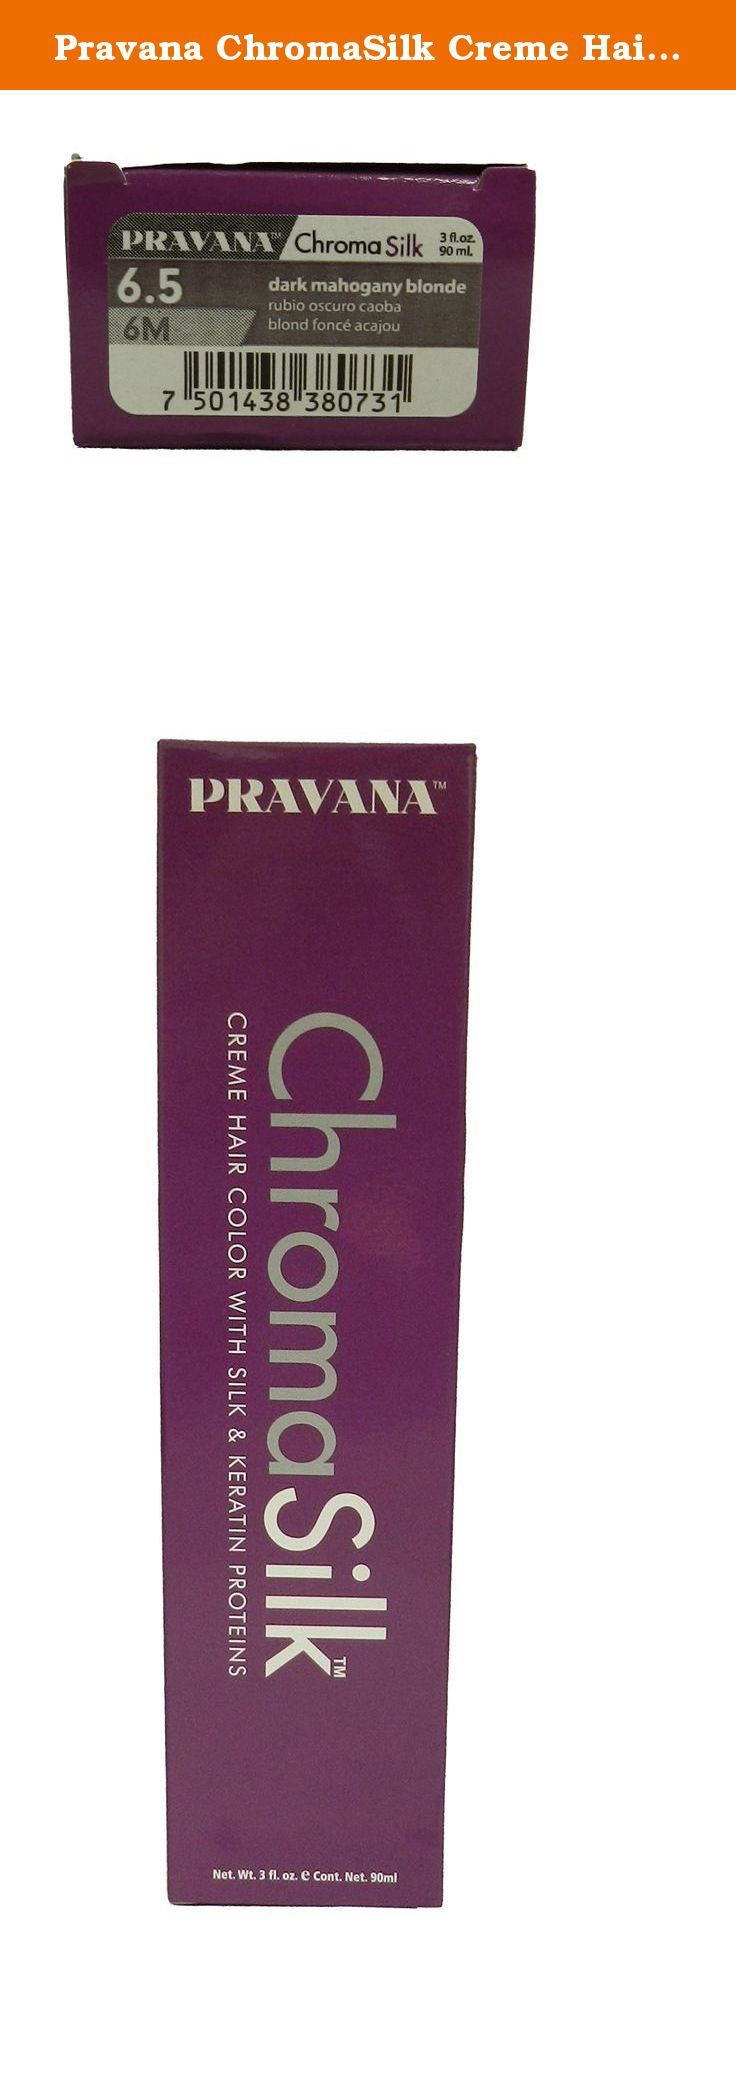 Pravana chromasilk creme hair color with silk keratin protein pravana chromasilk creme hair color with silk keratin protein 65 dark mahogany blonde what nvjuhfo Images